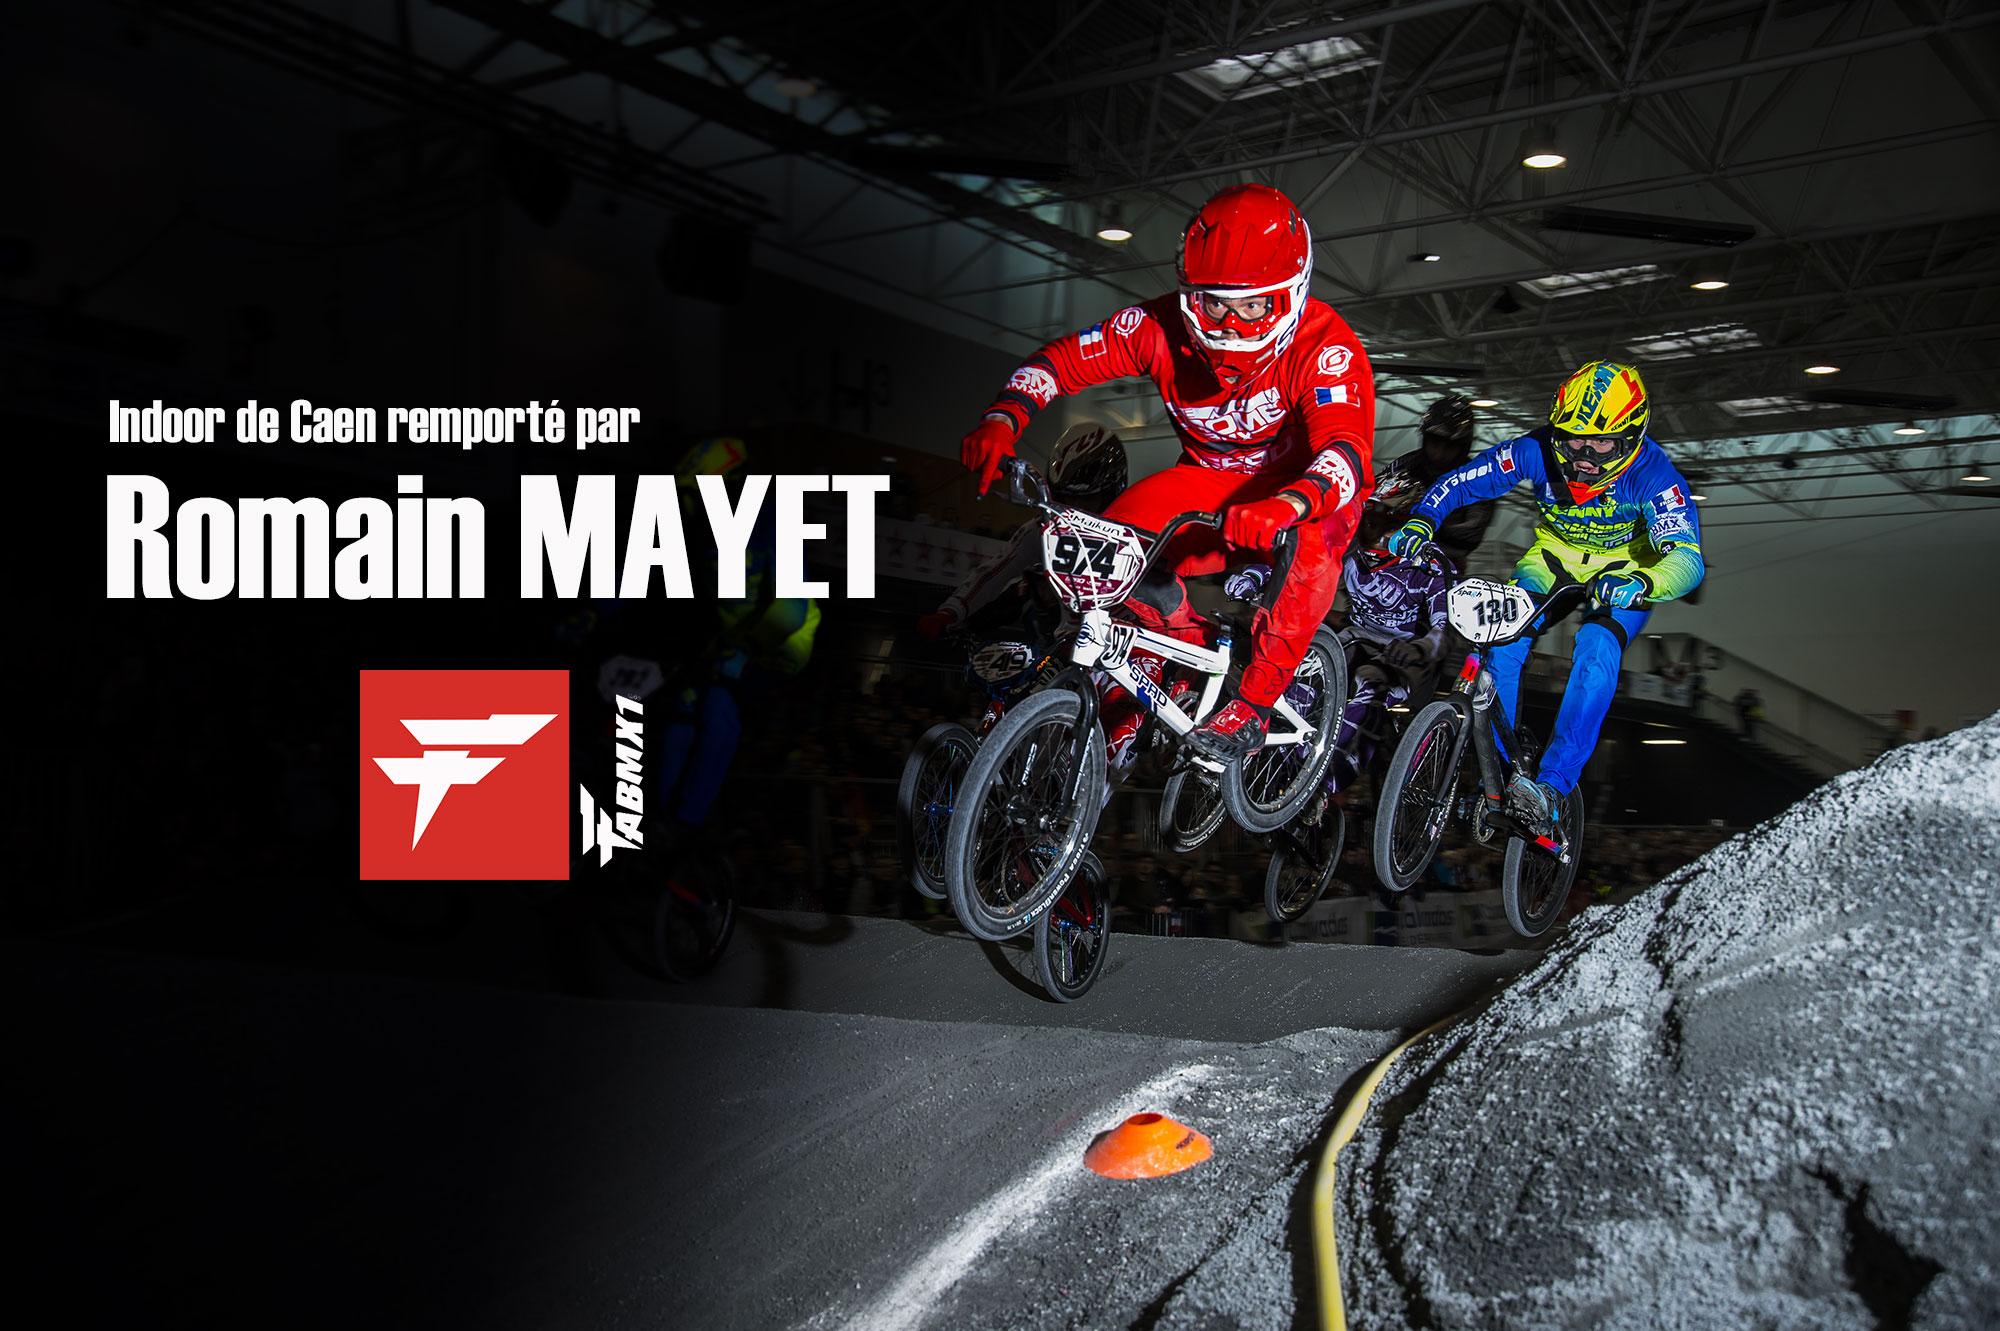 Romain MAYET remporte l'Indoor de Caen